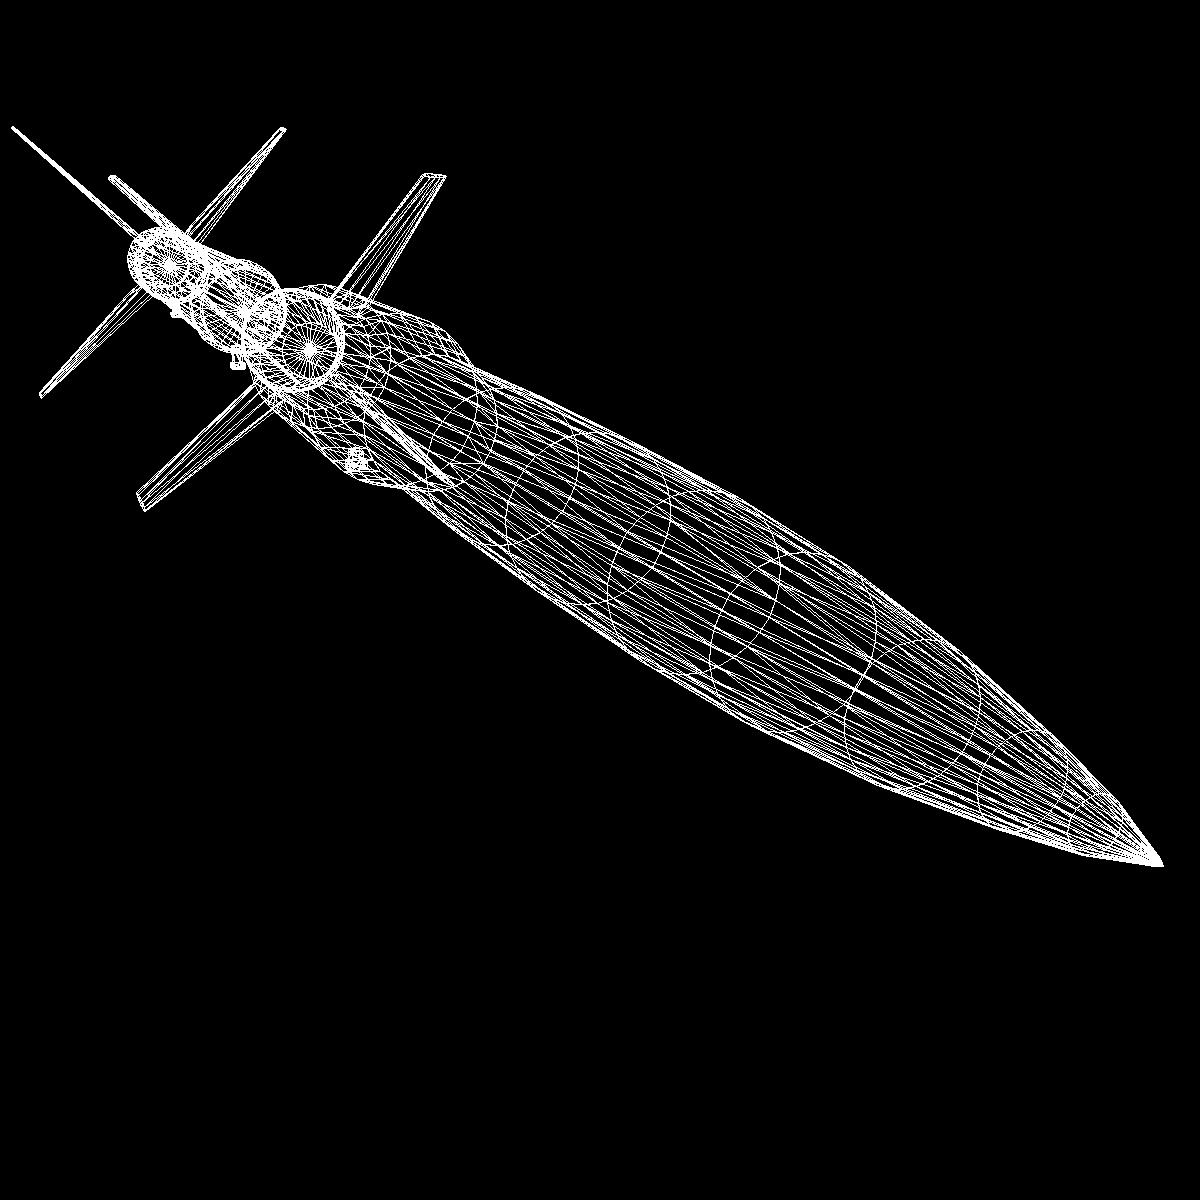 Astrobee 200 Rocket 3d model 3ds dxf fbx blend cob dae X   obj 165970